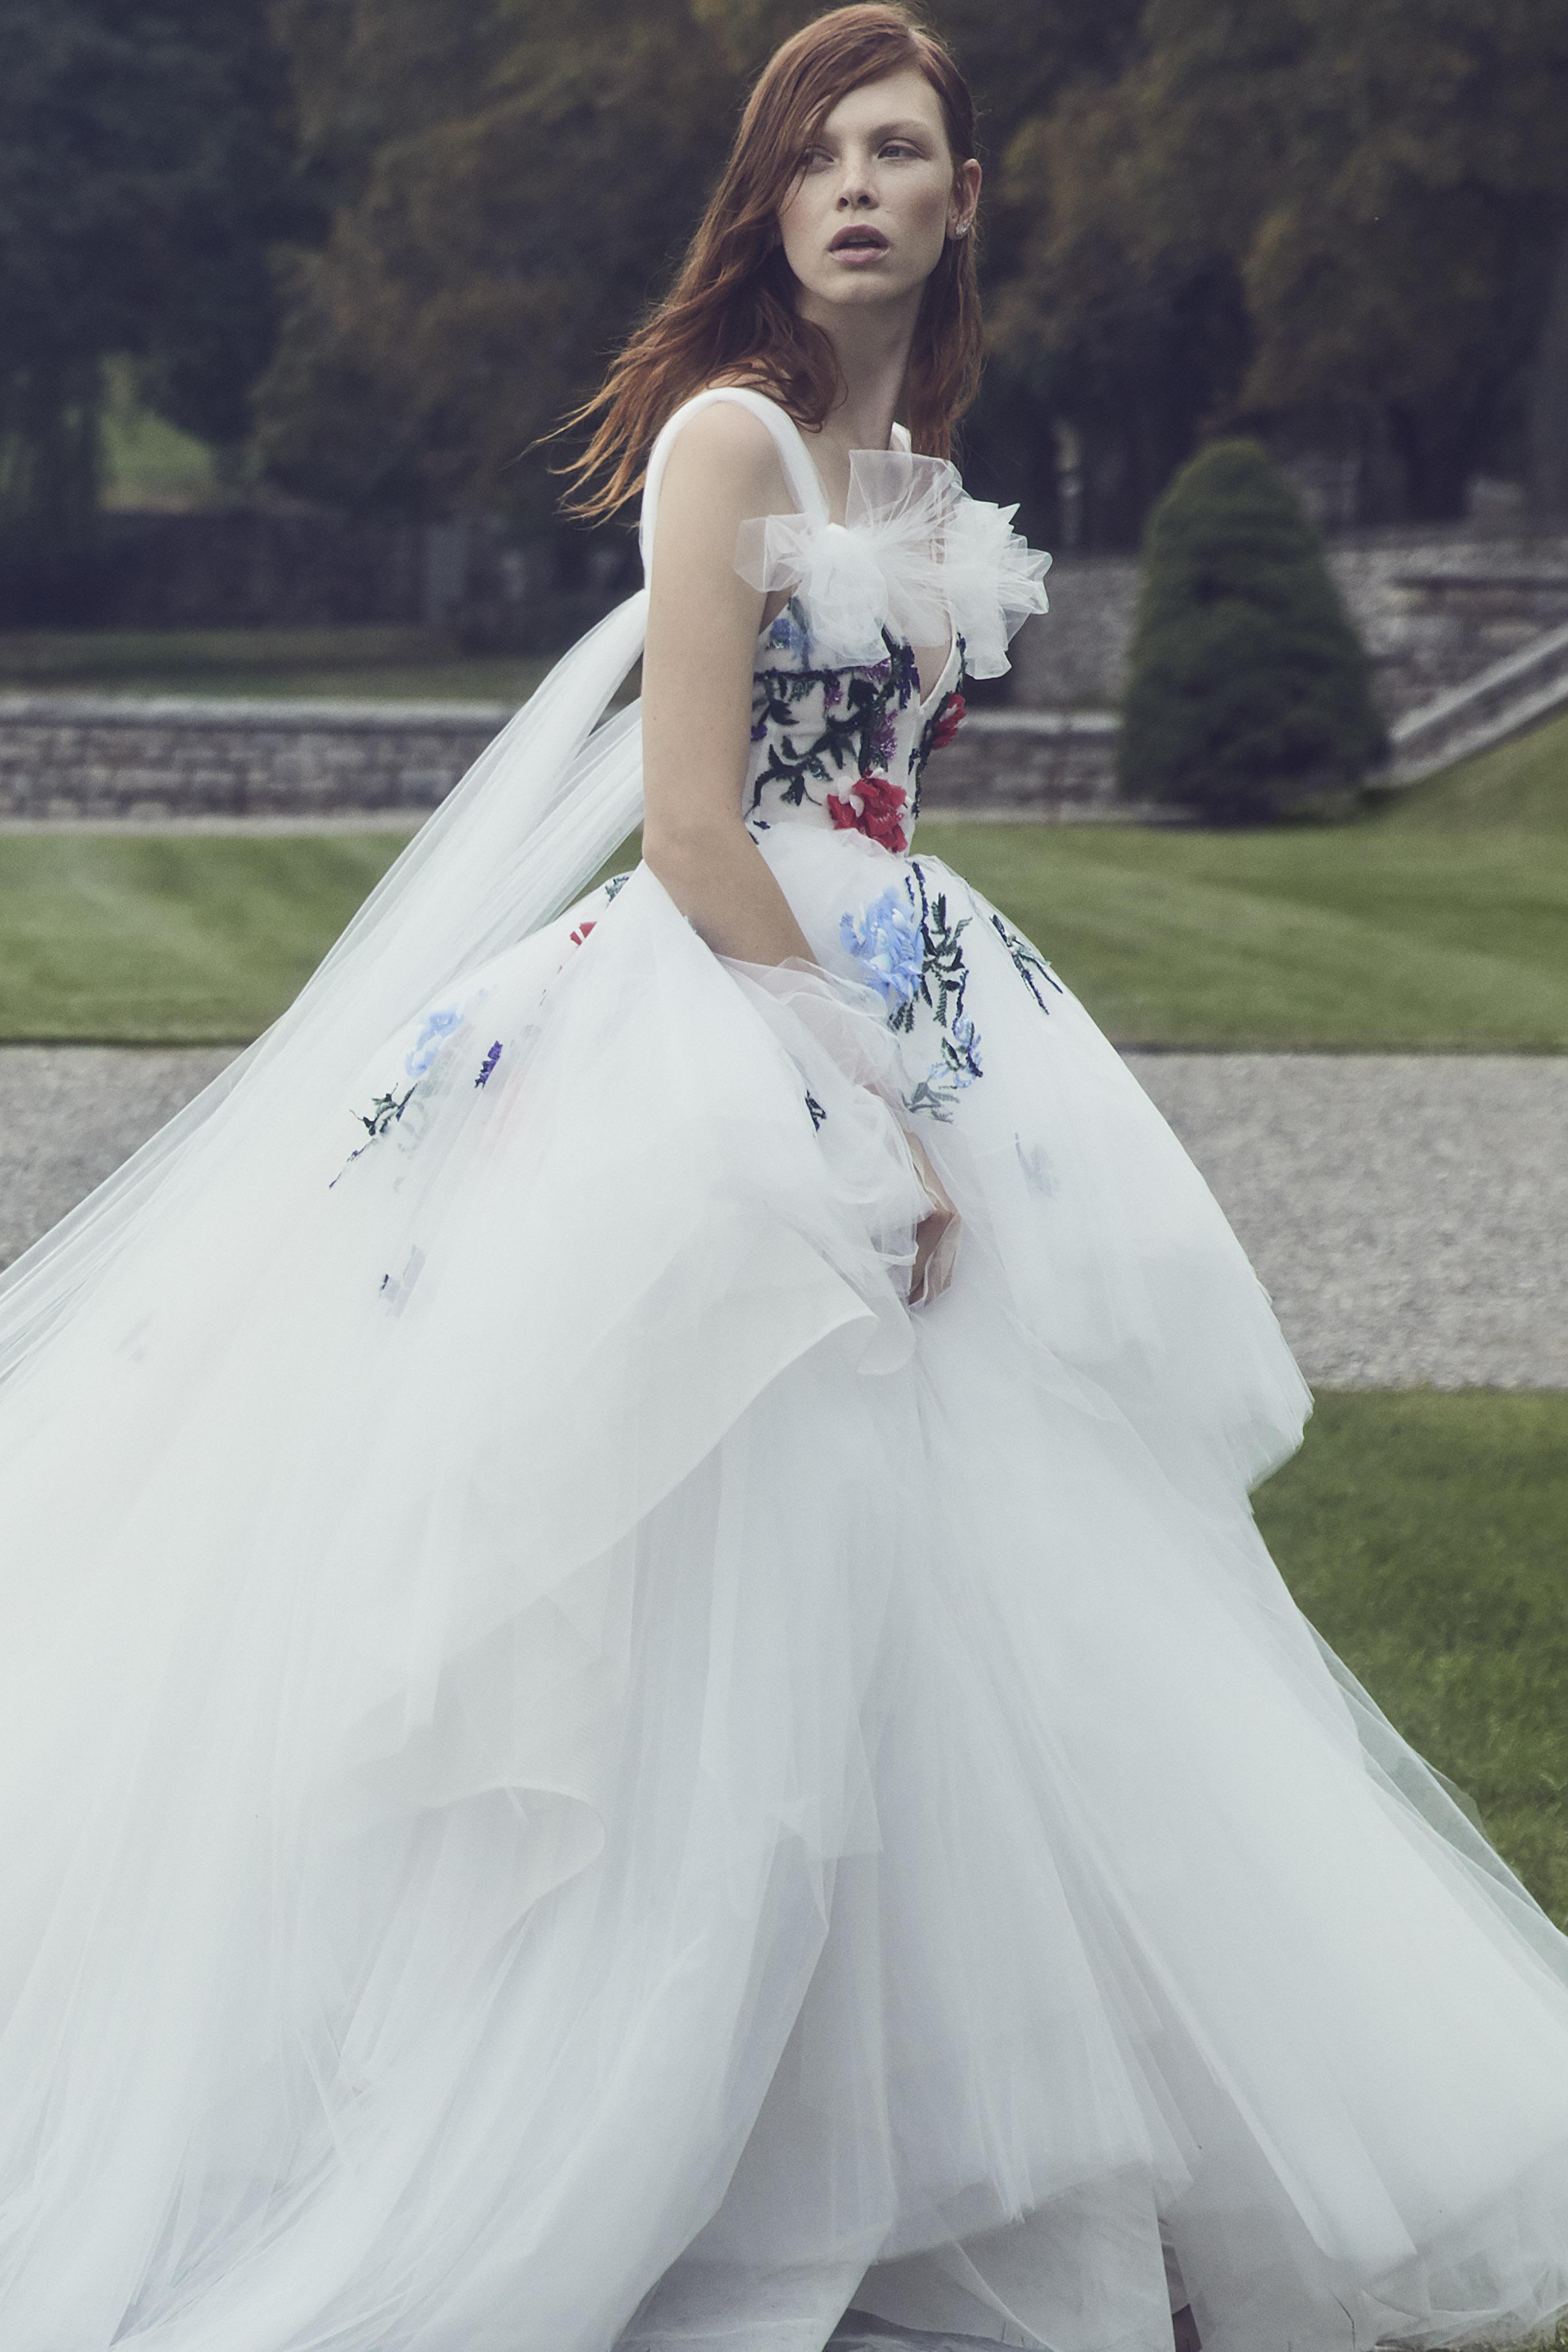 monique lhuillier fall 2019 v-neck ballgown with colorful floral applique